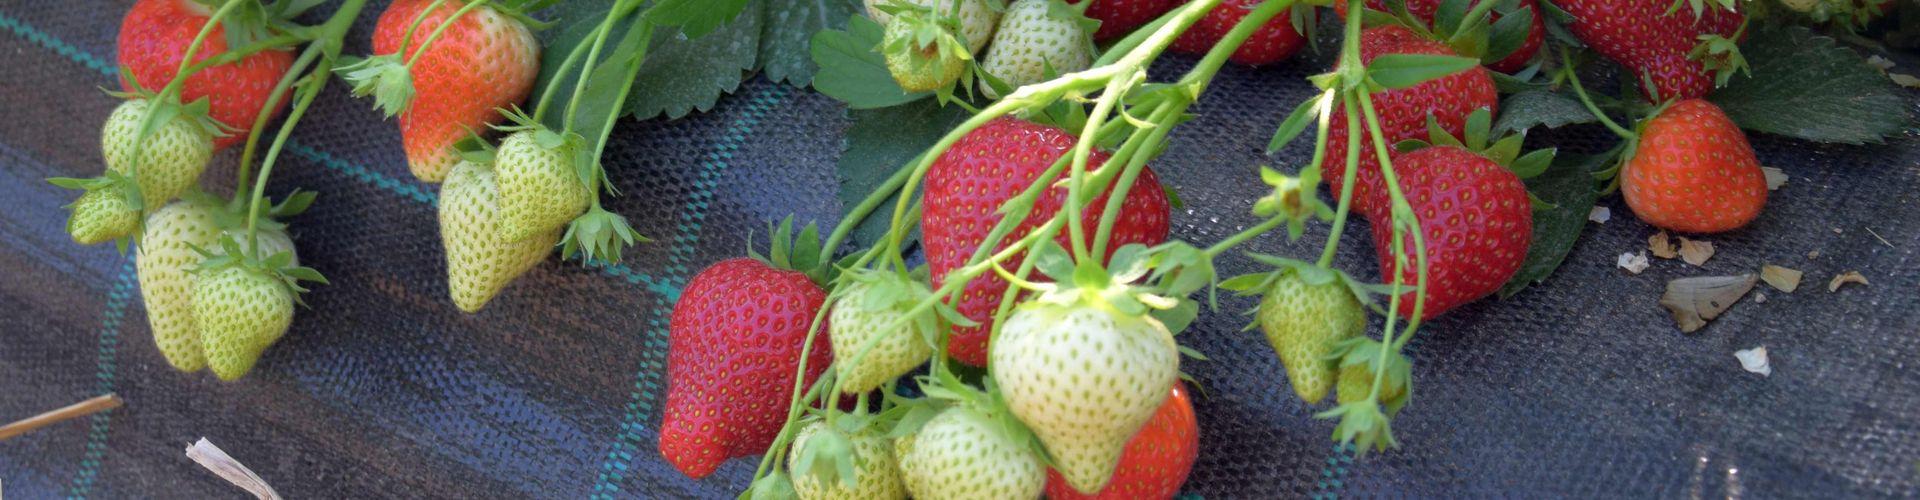 Erdbeeren im Substratdamm